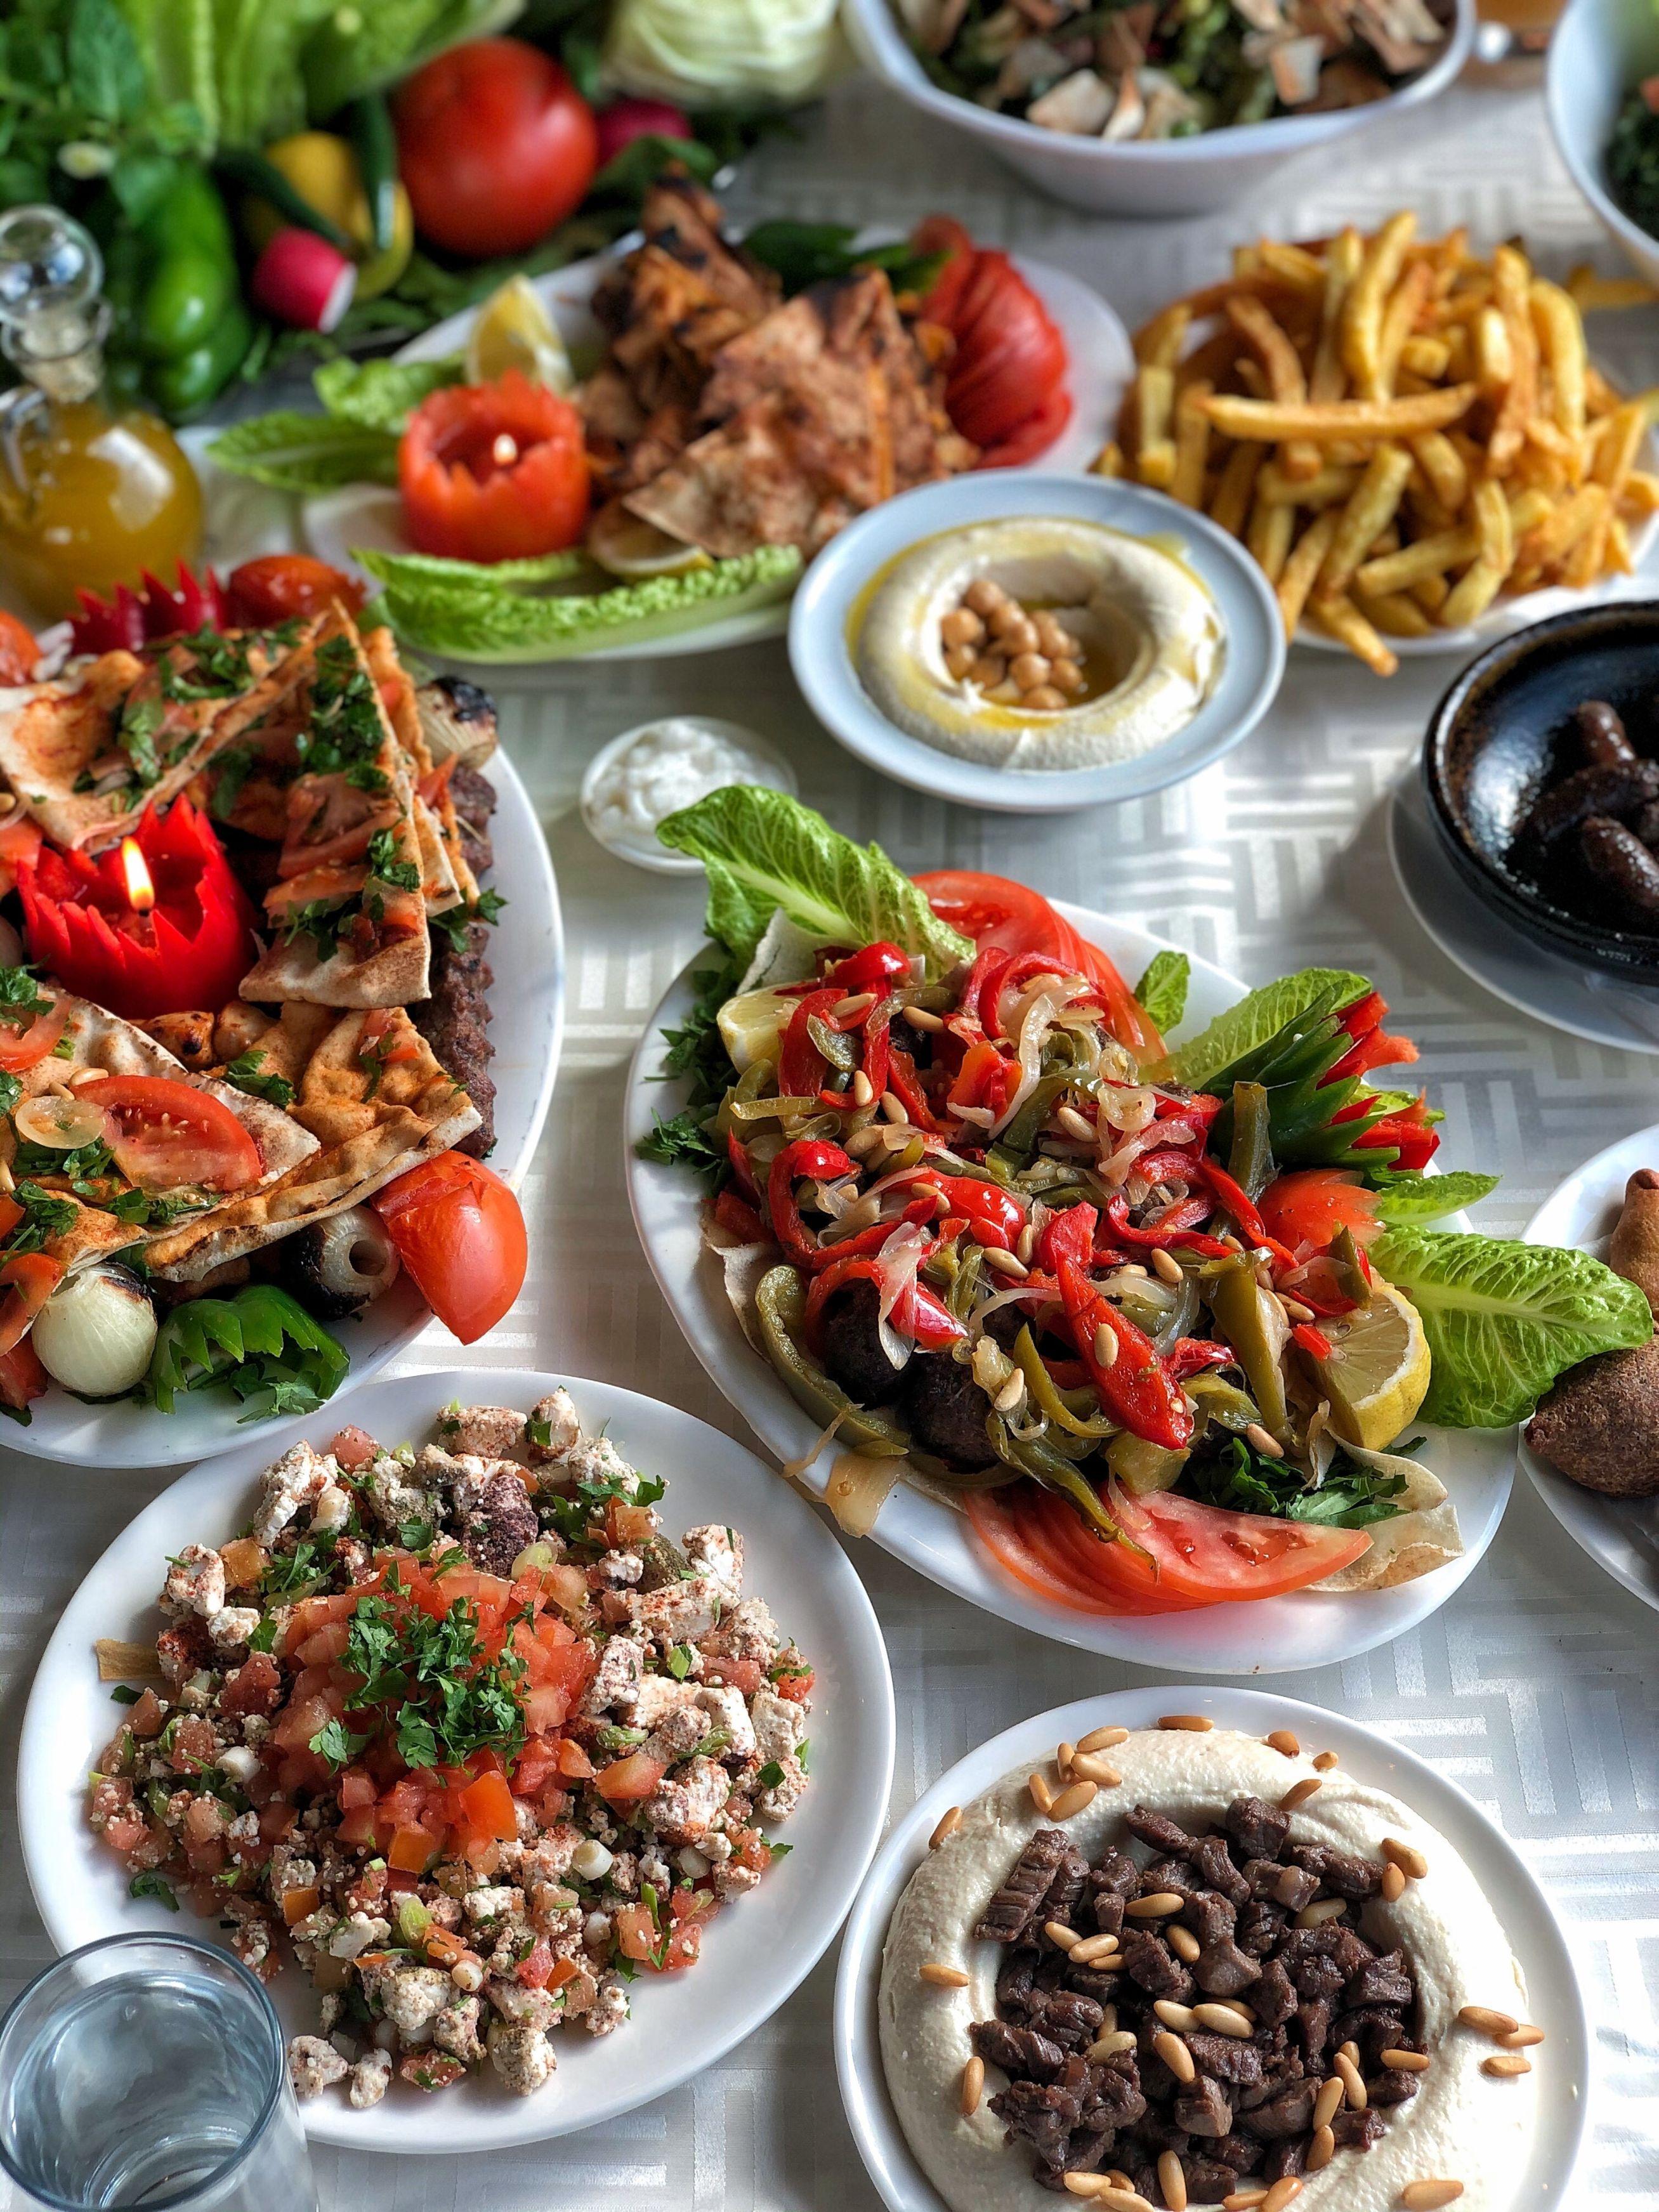 Guide to Top 10 Ahi Dishes in Honolulu - Hawaii   Food